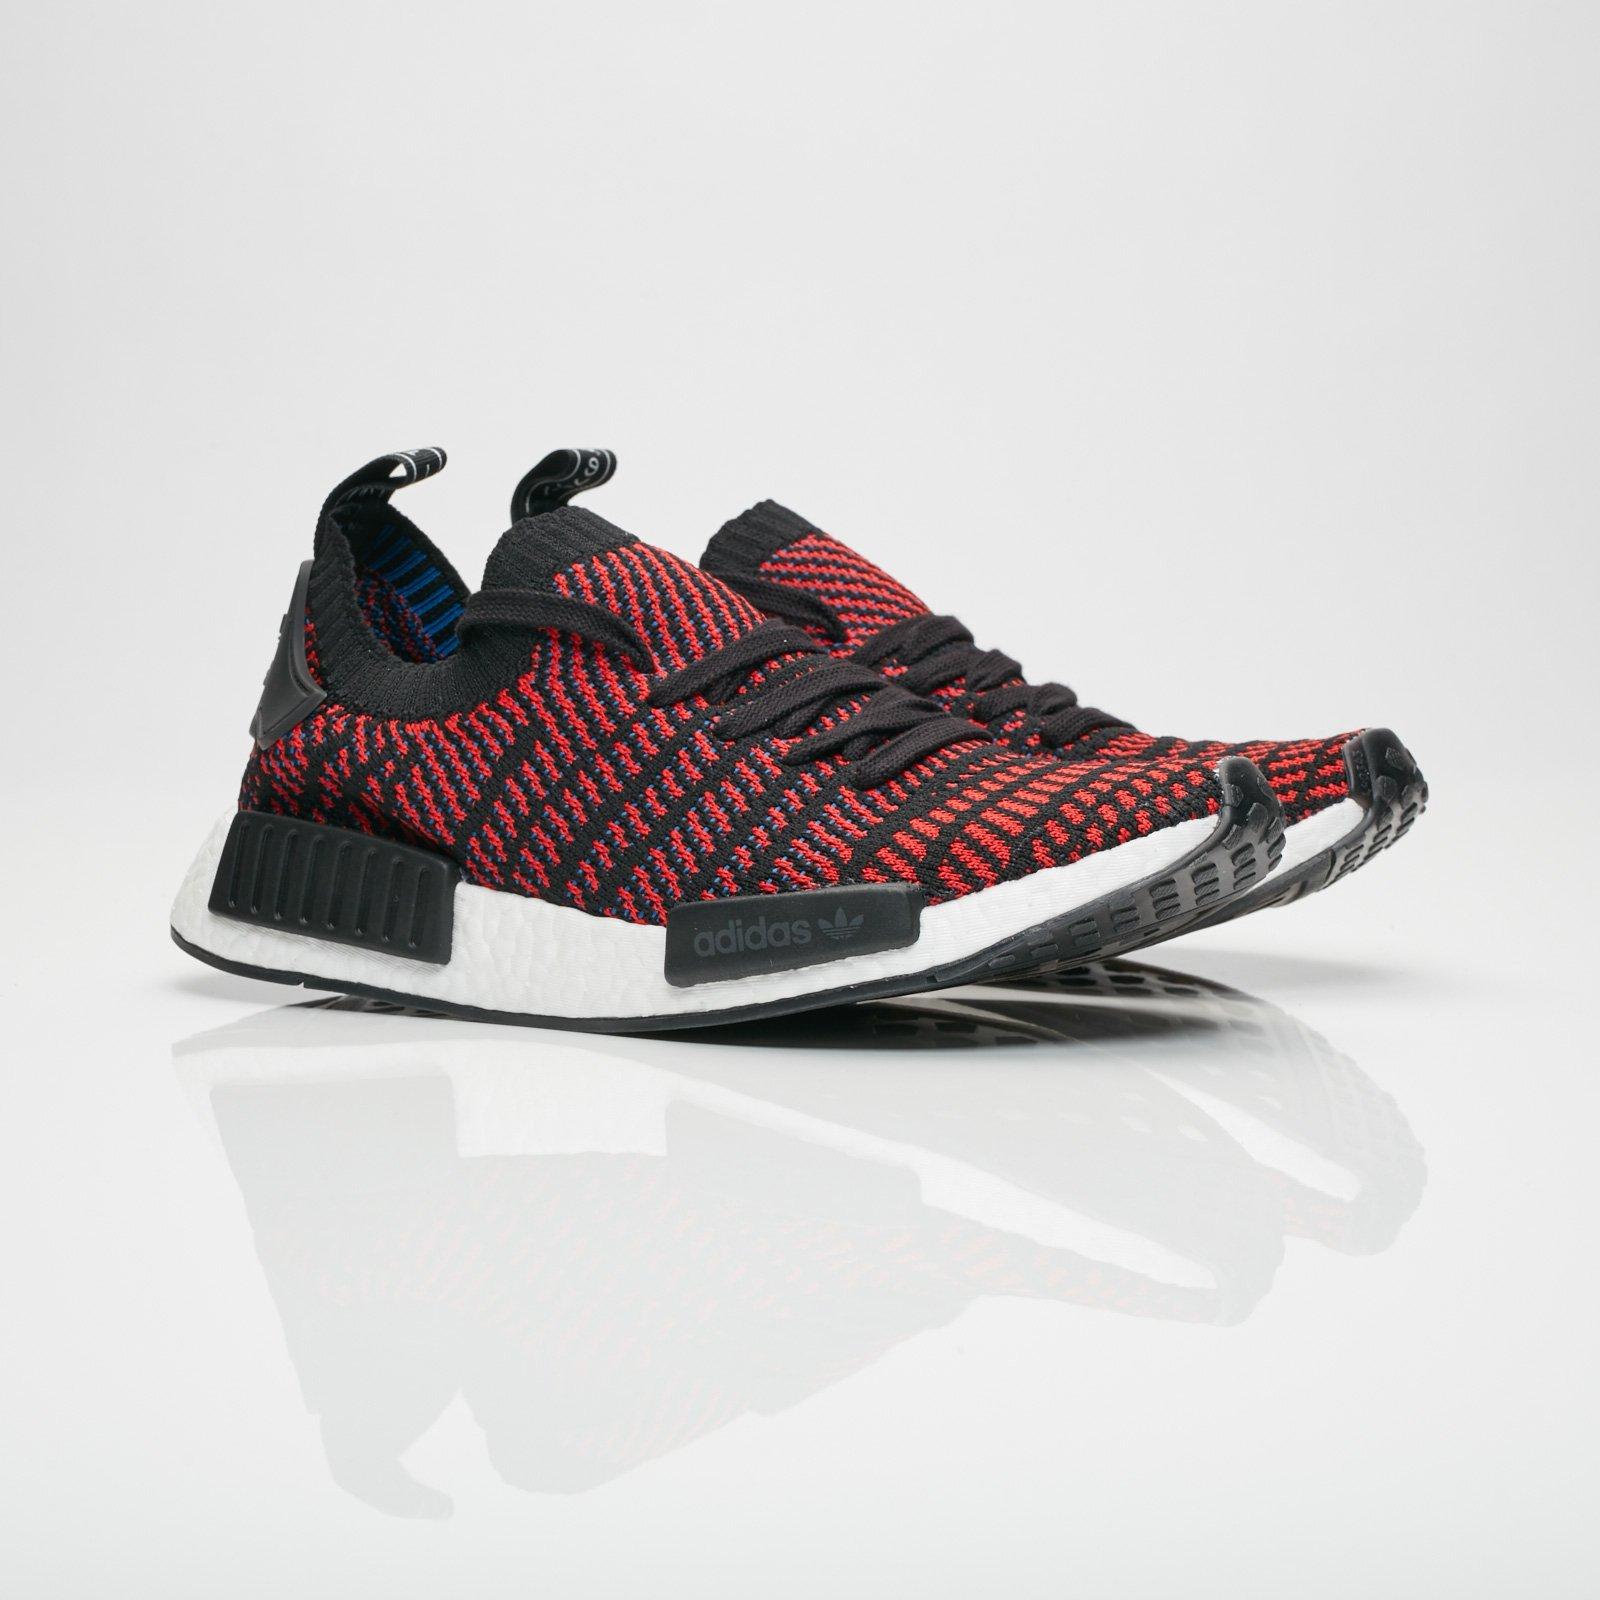 adidas nmd r1 stlt pk